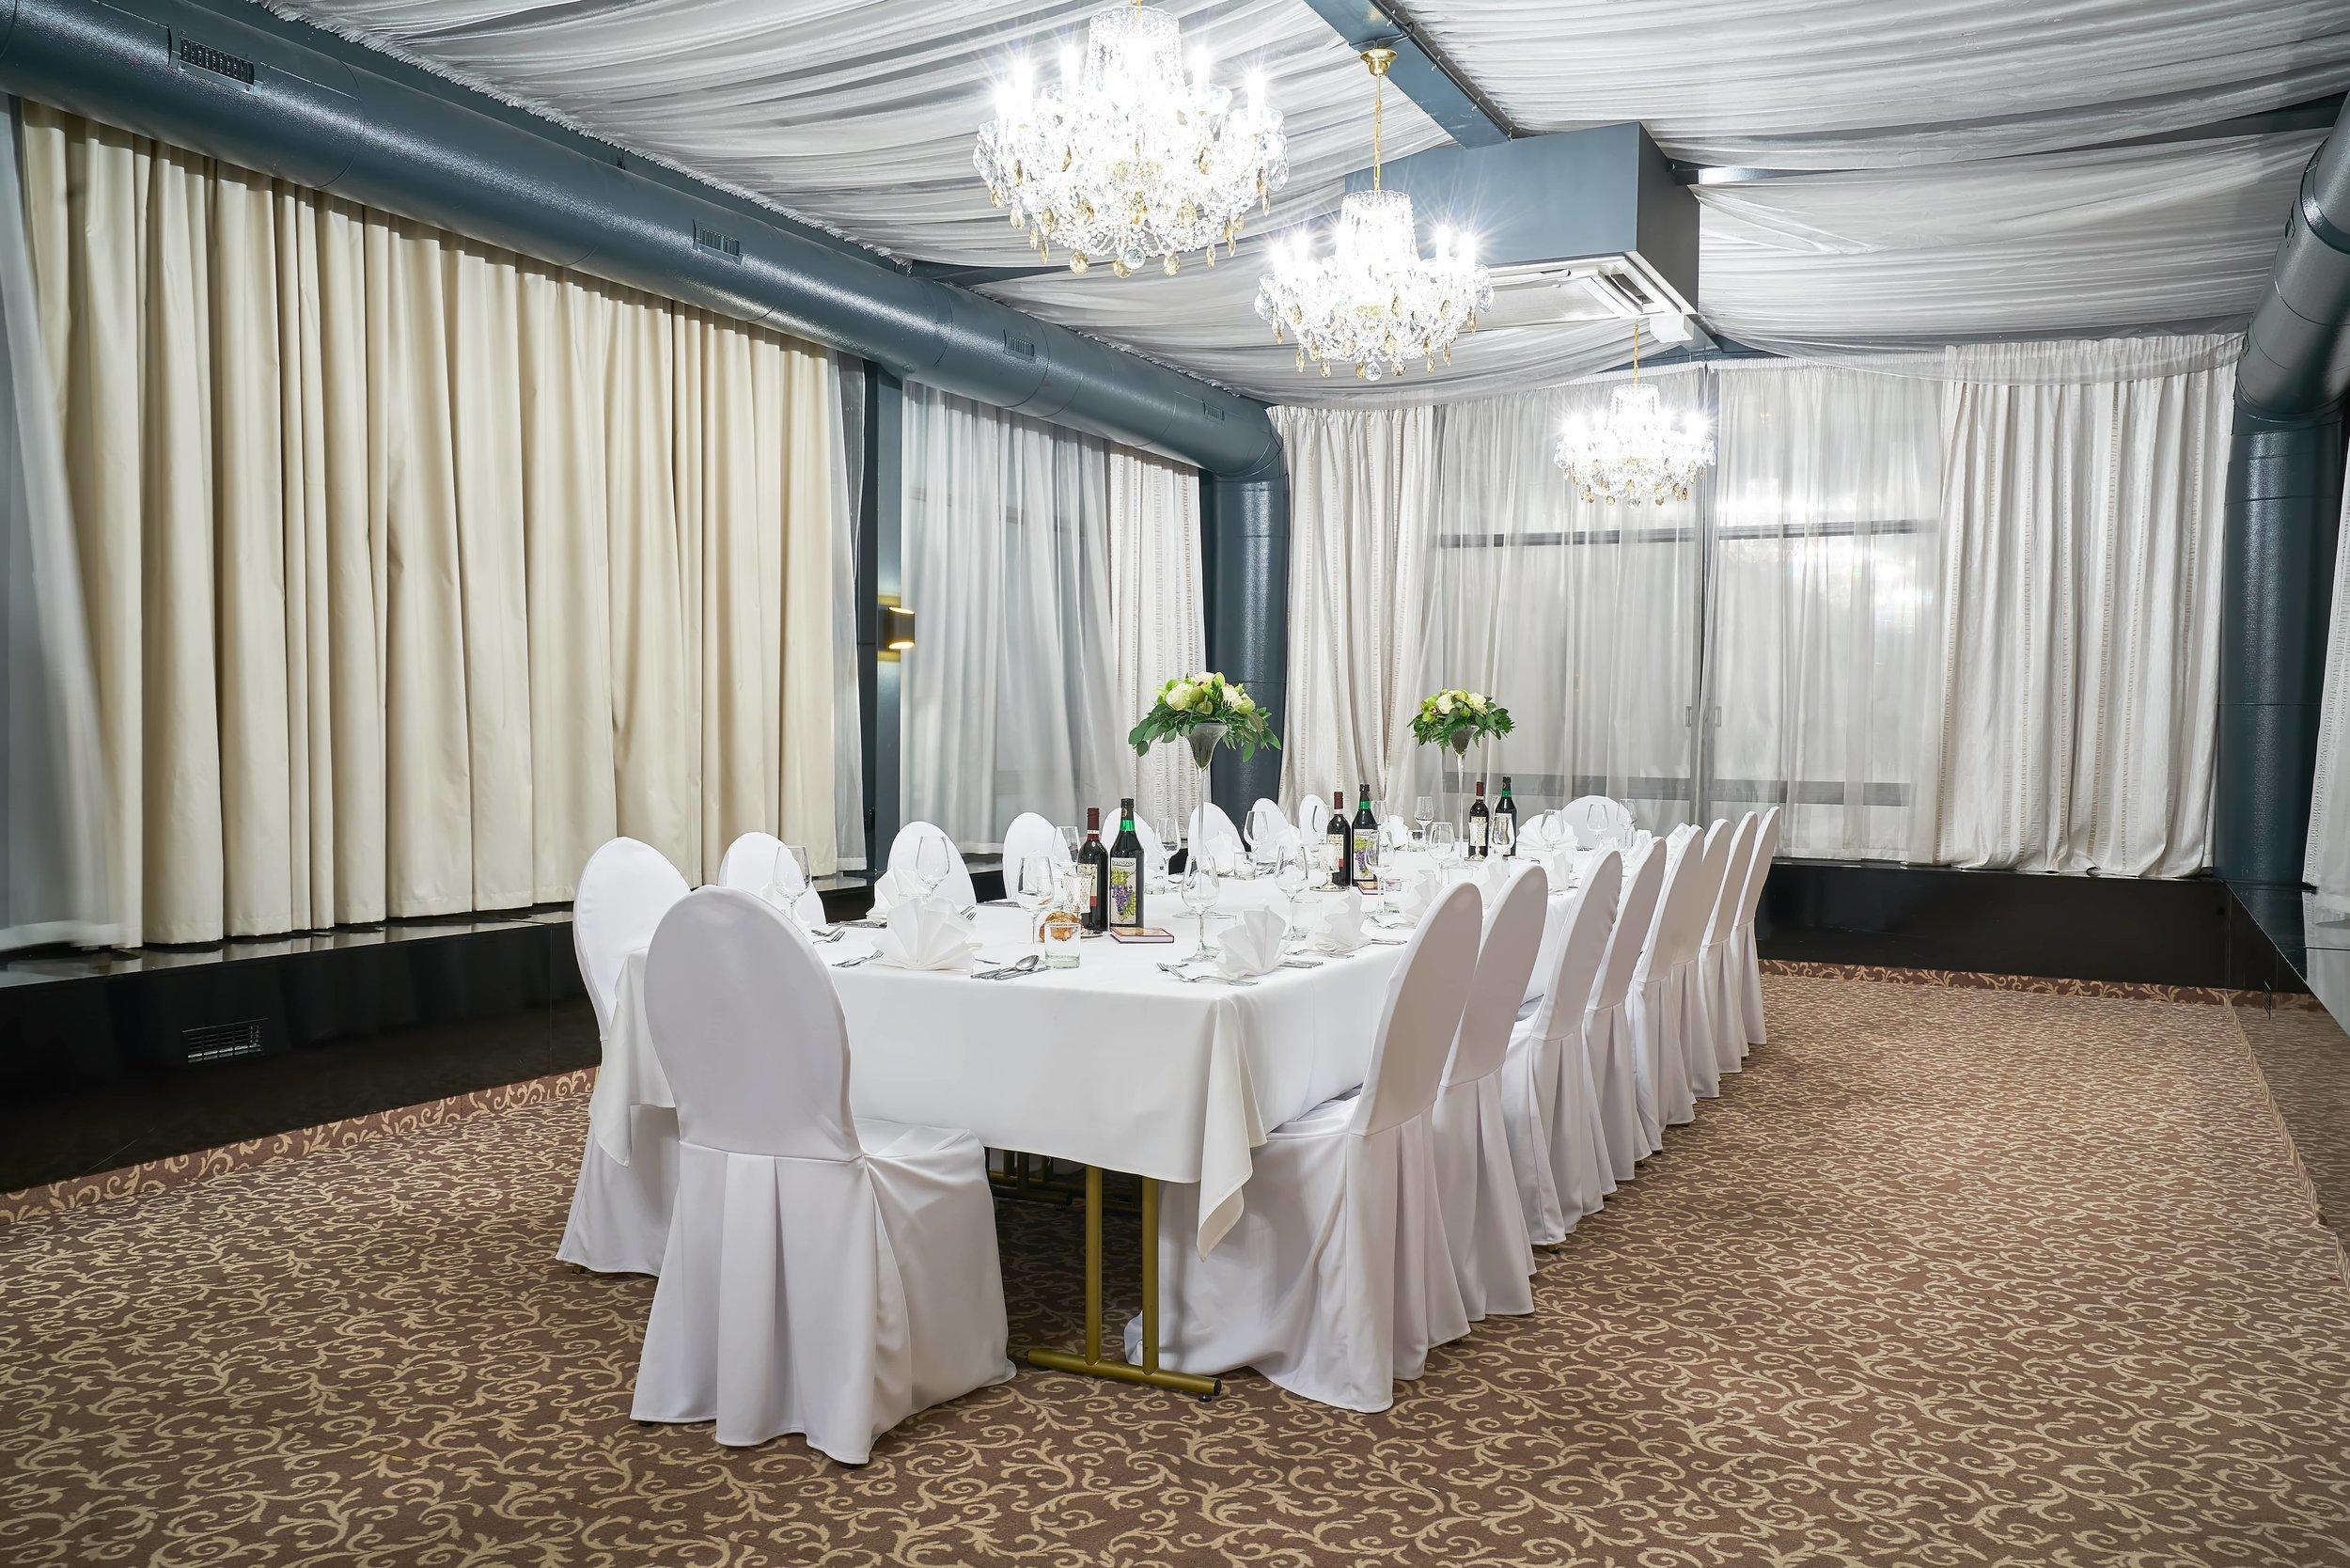 Hotel-King-David-Wranovsky-Crystal-Chandelier-1.jpg